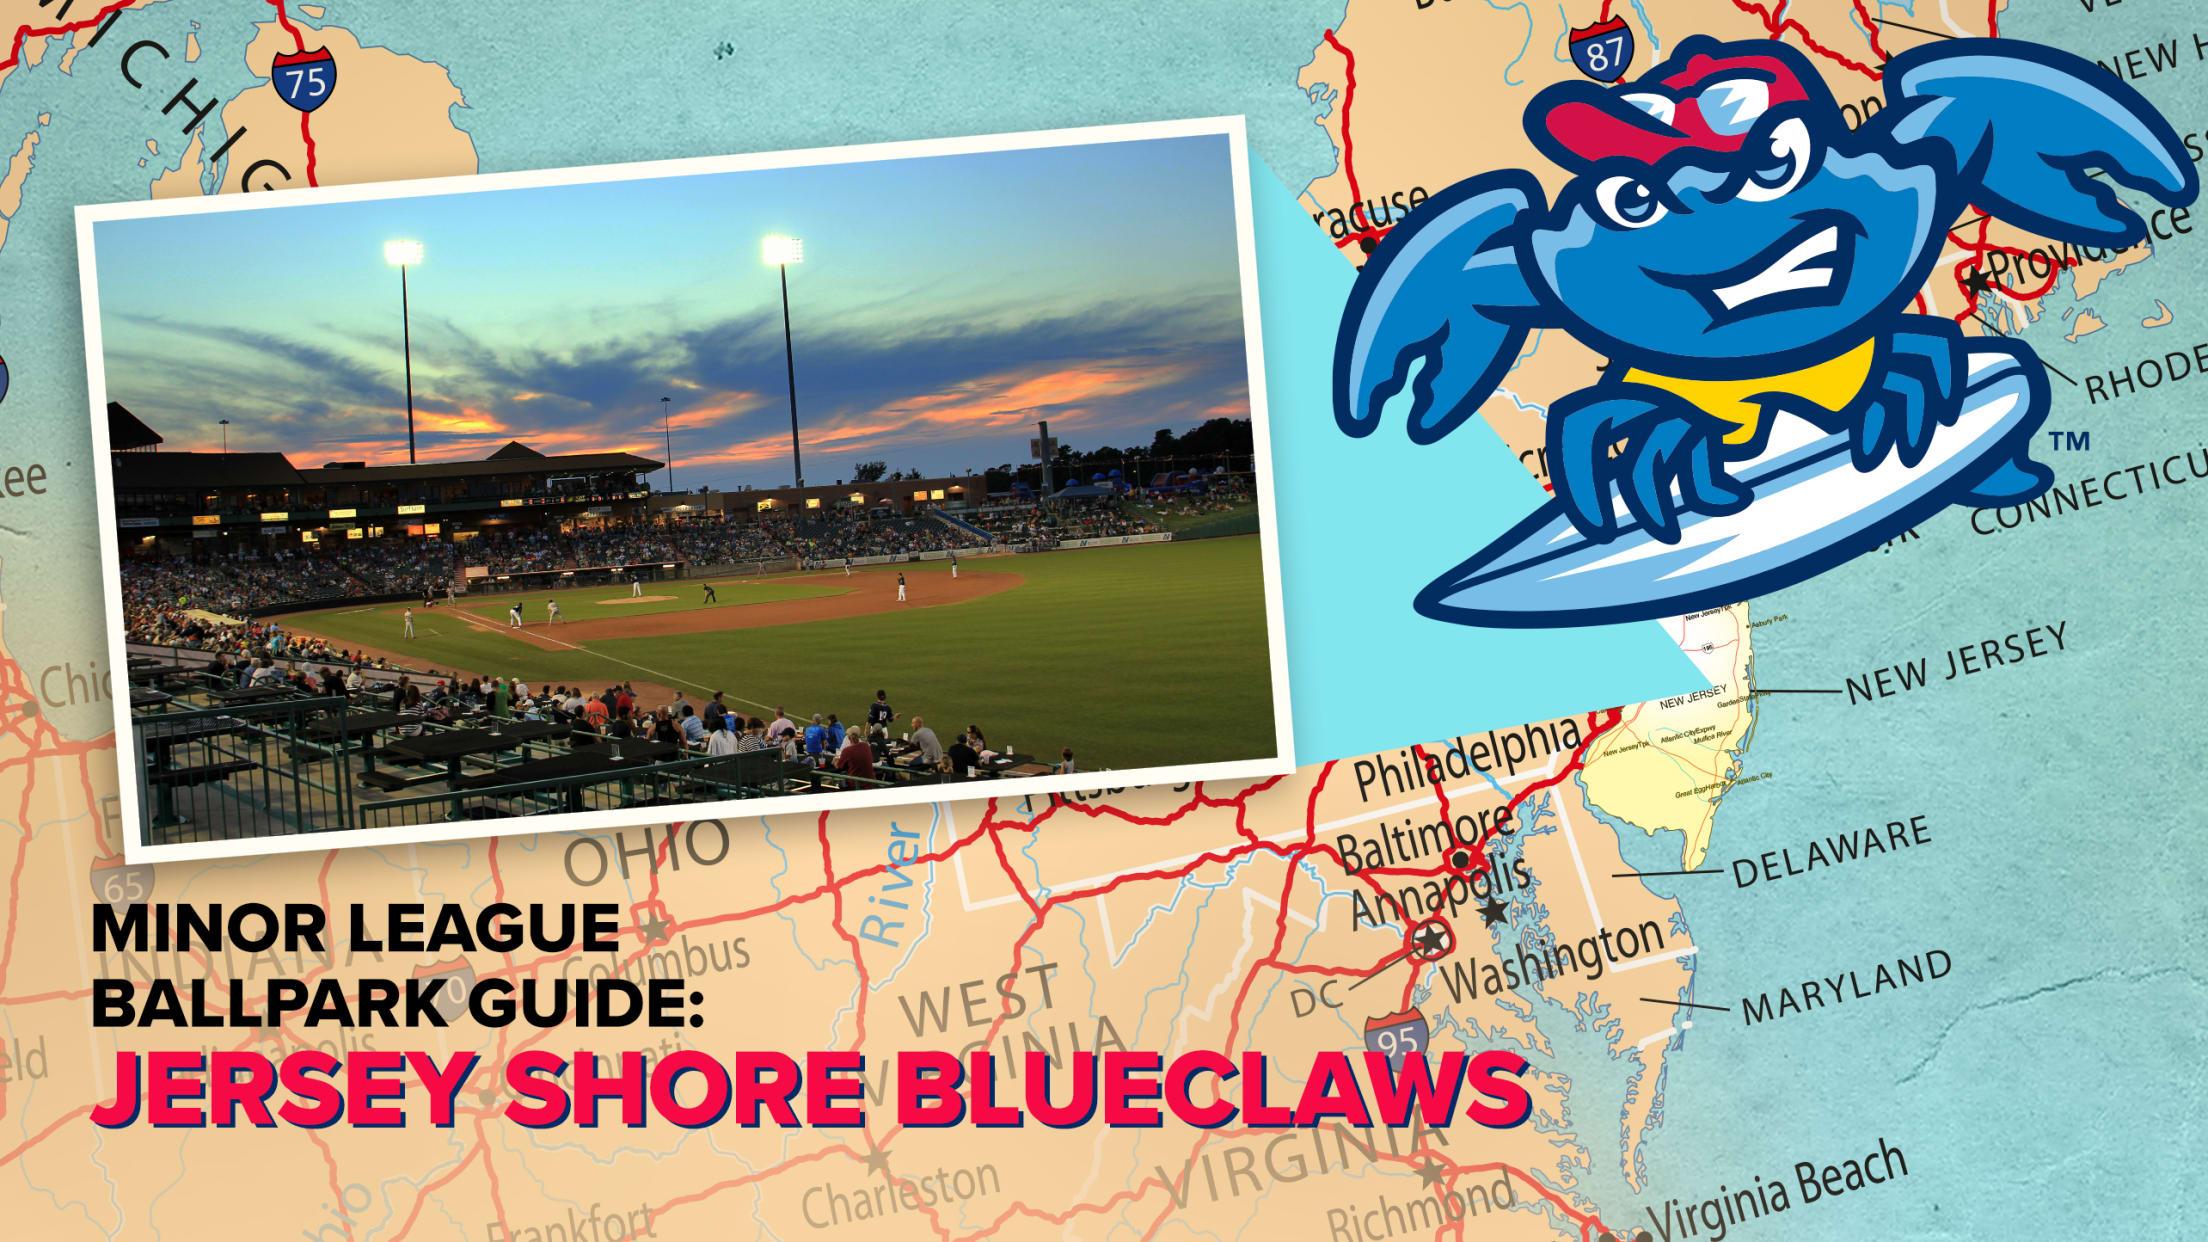 2568x1445-Stadium_Map_JerseyShore